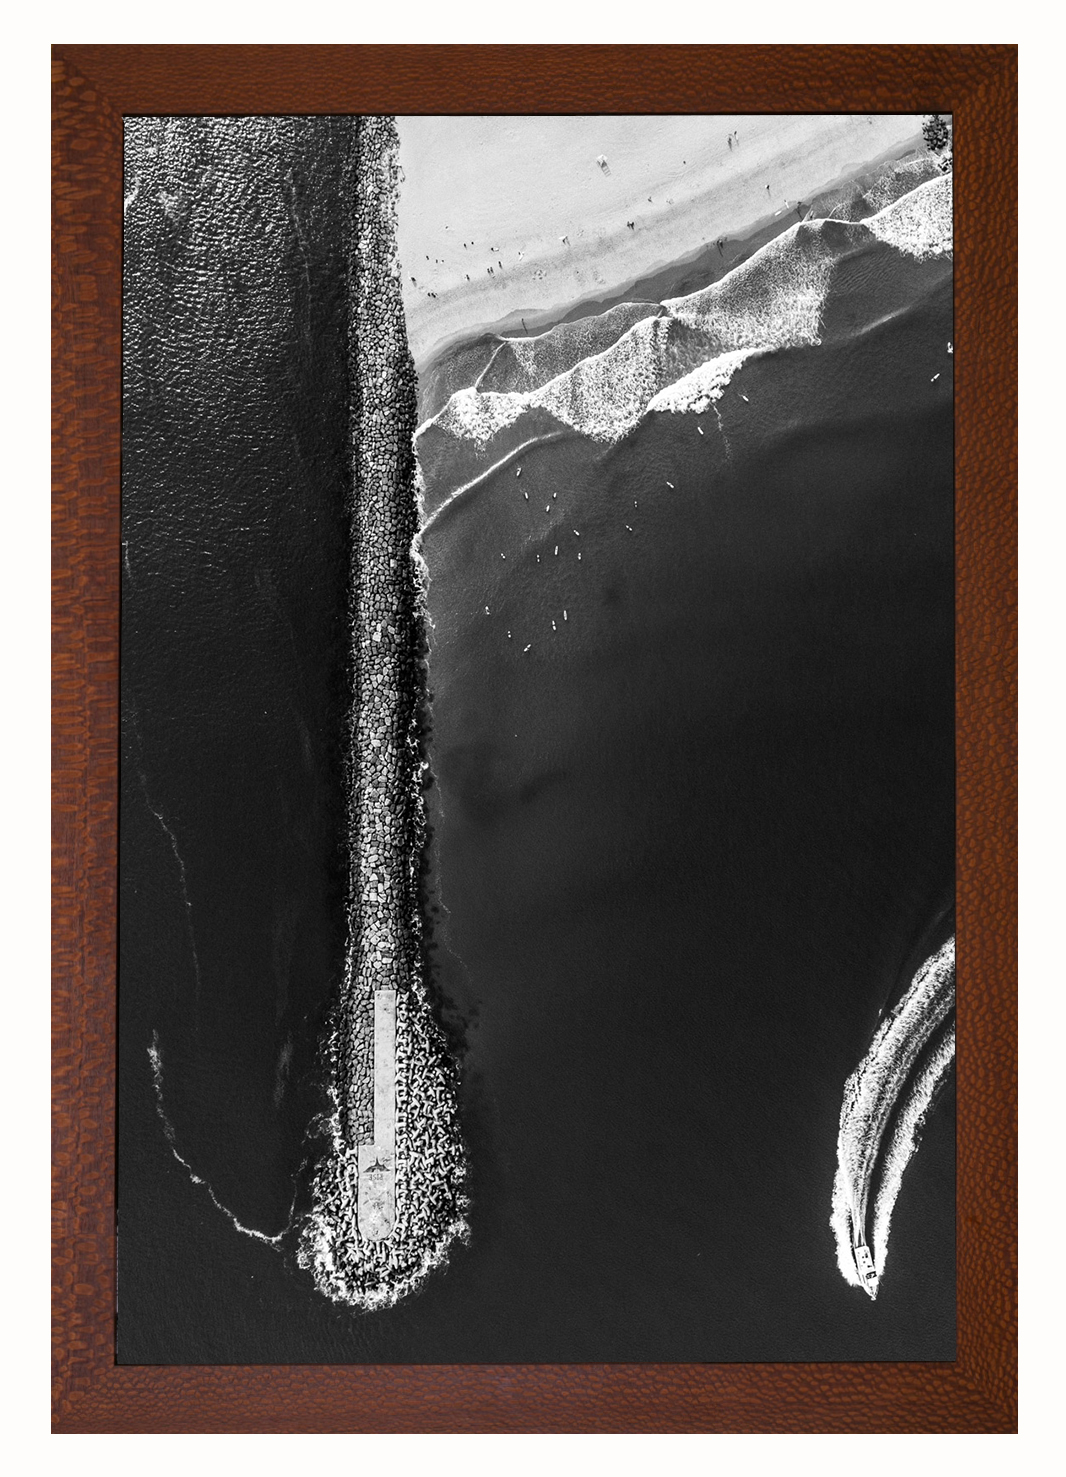 Matt Paul 24 x 36 edition 3/1AP $1,800.00